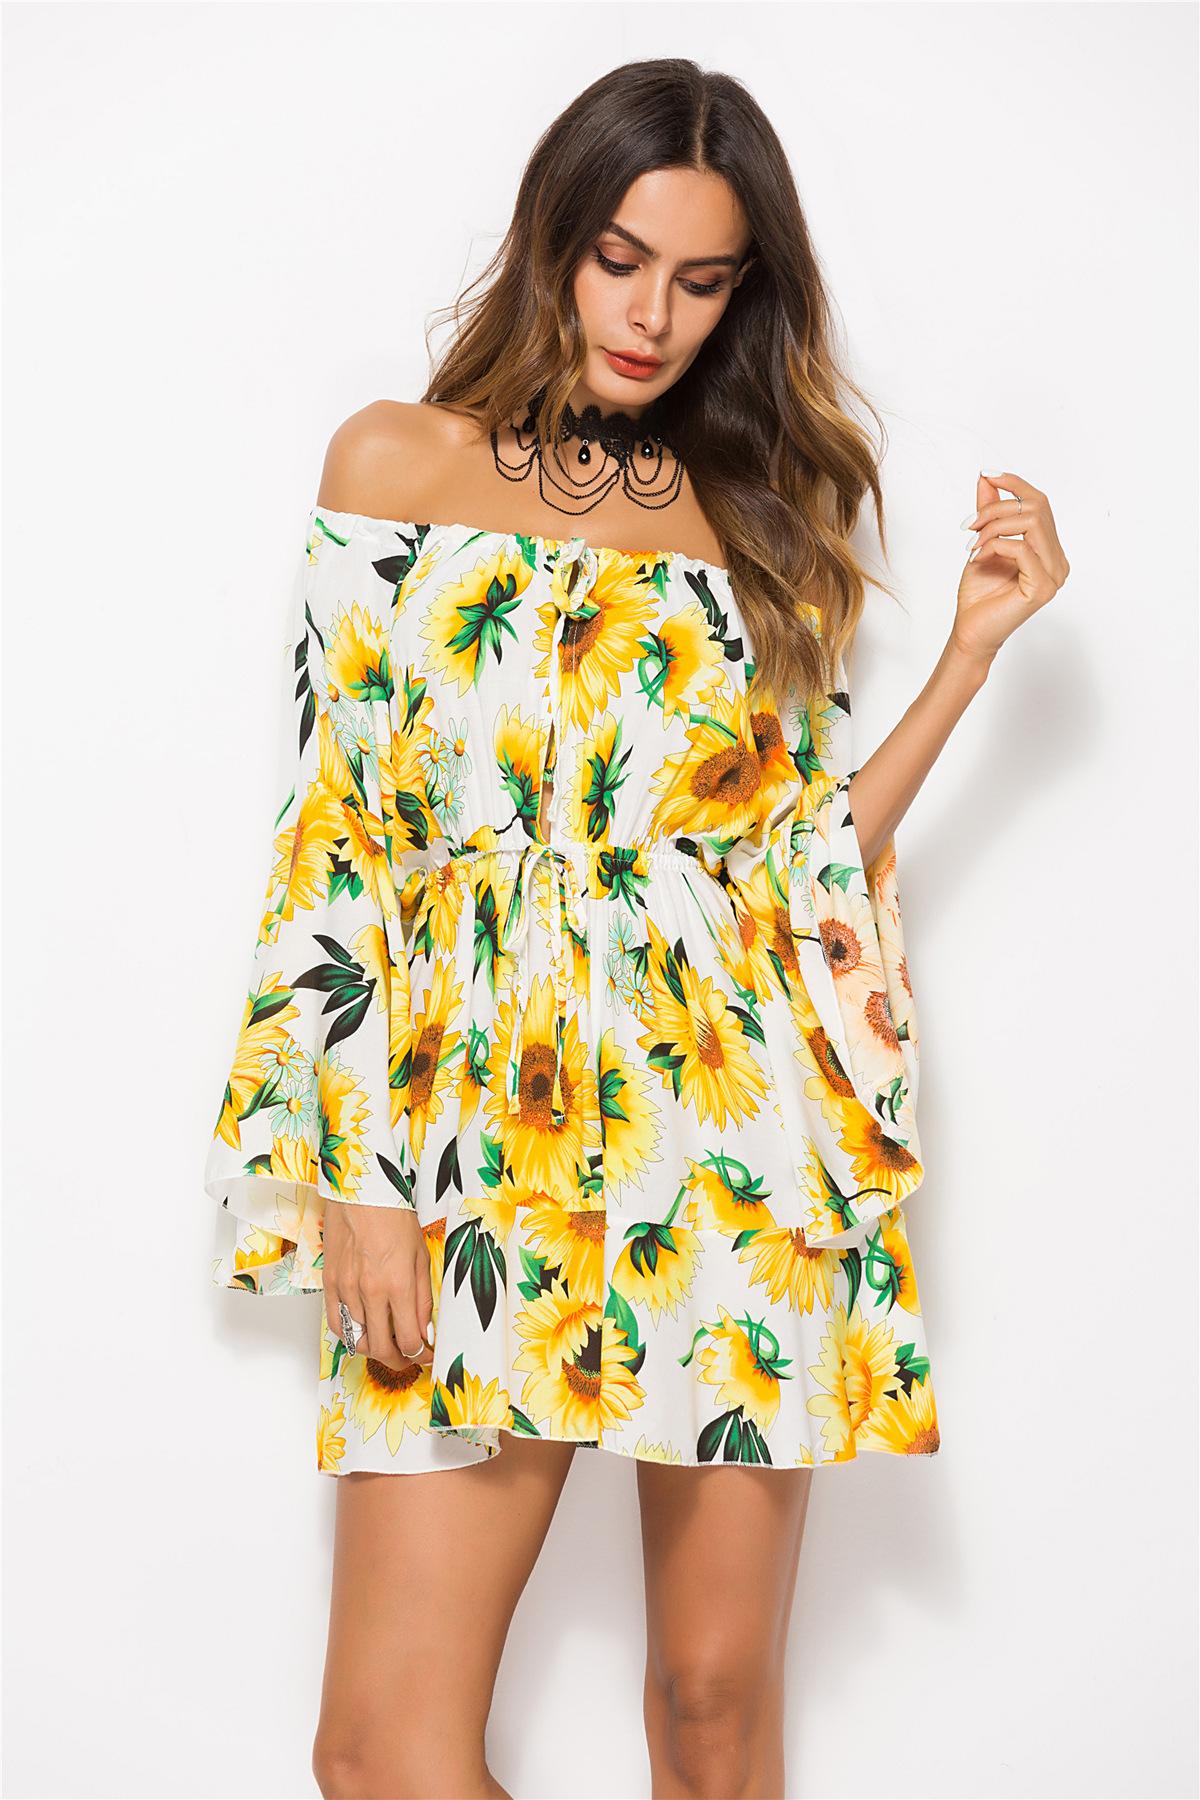 Women Summer Bohemian Beach Dress New Tropical Leaf Floral